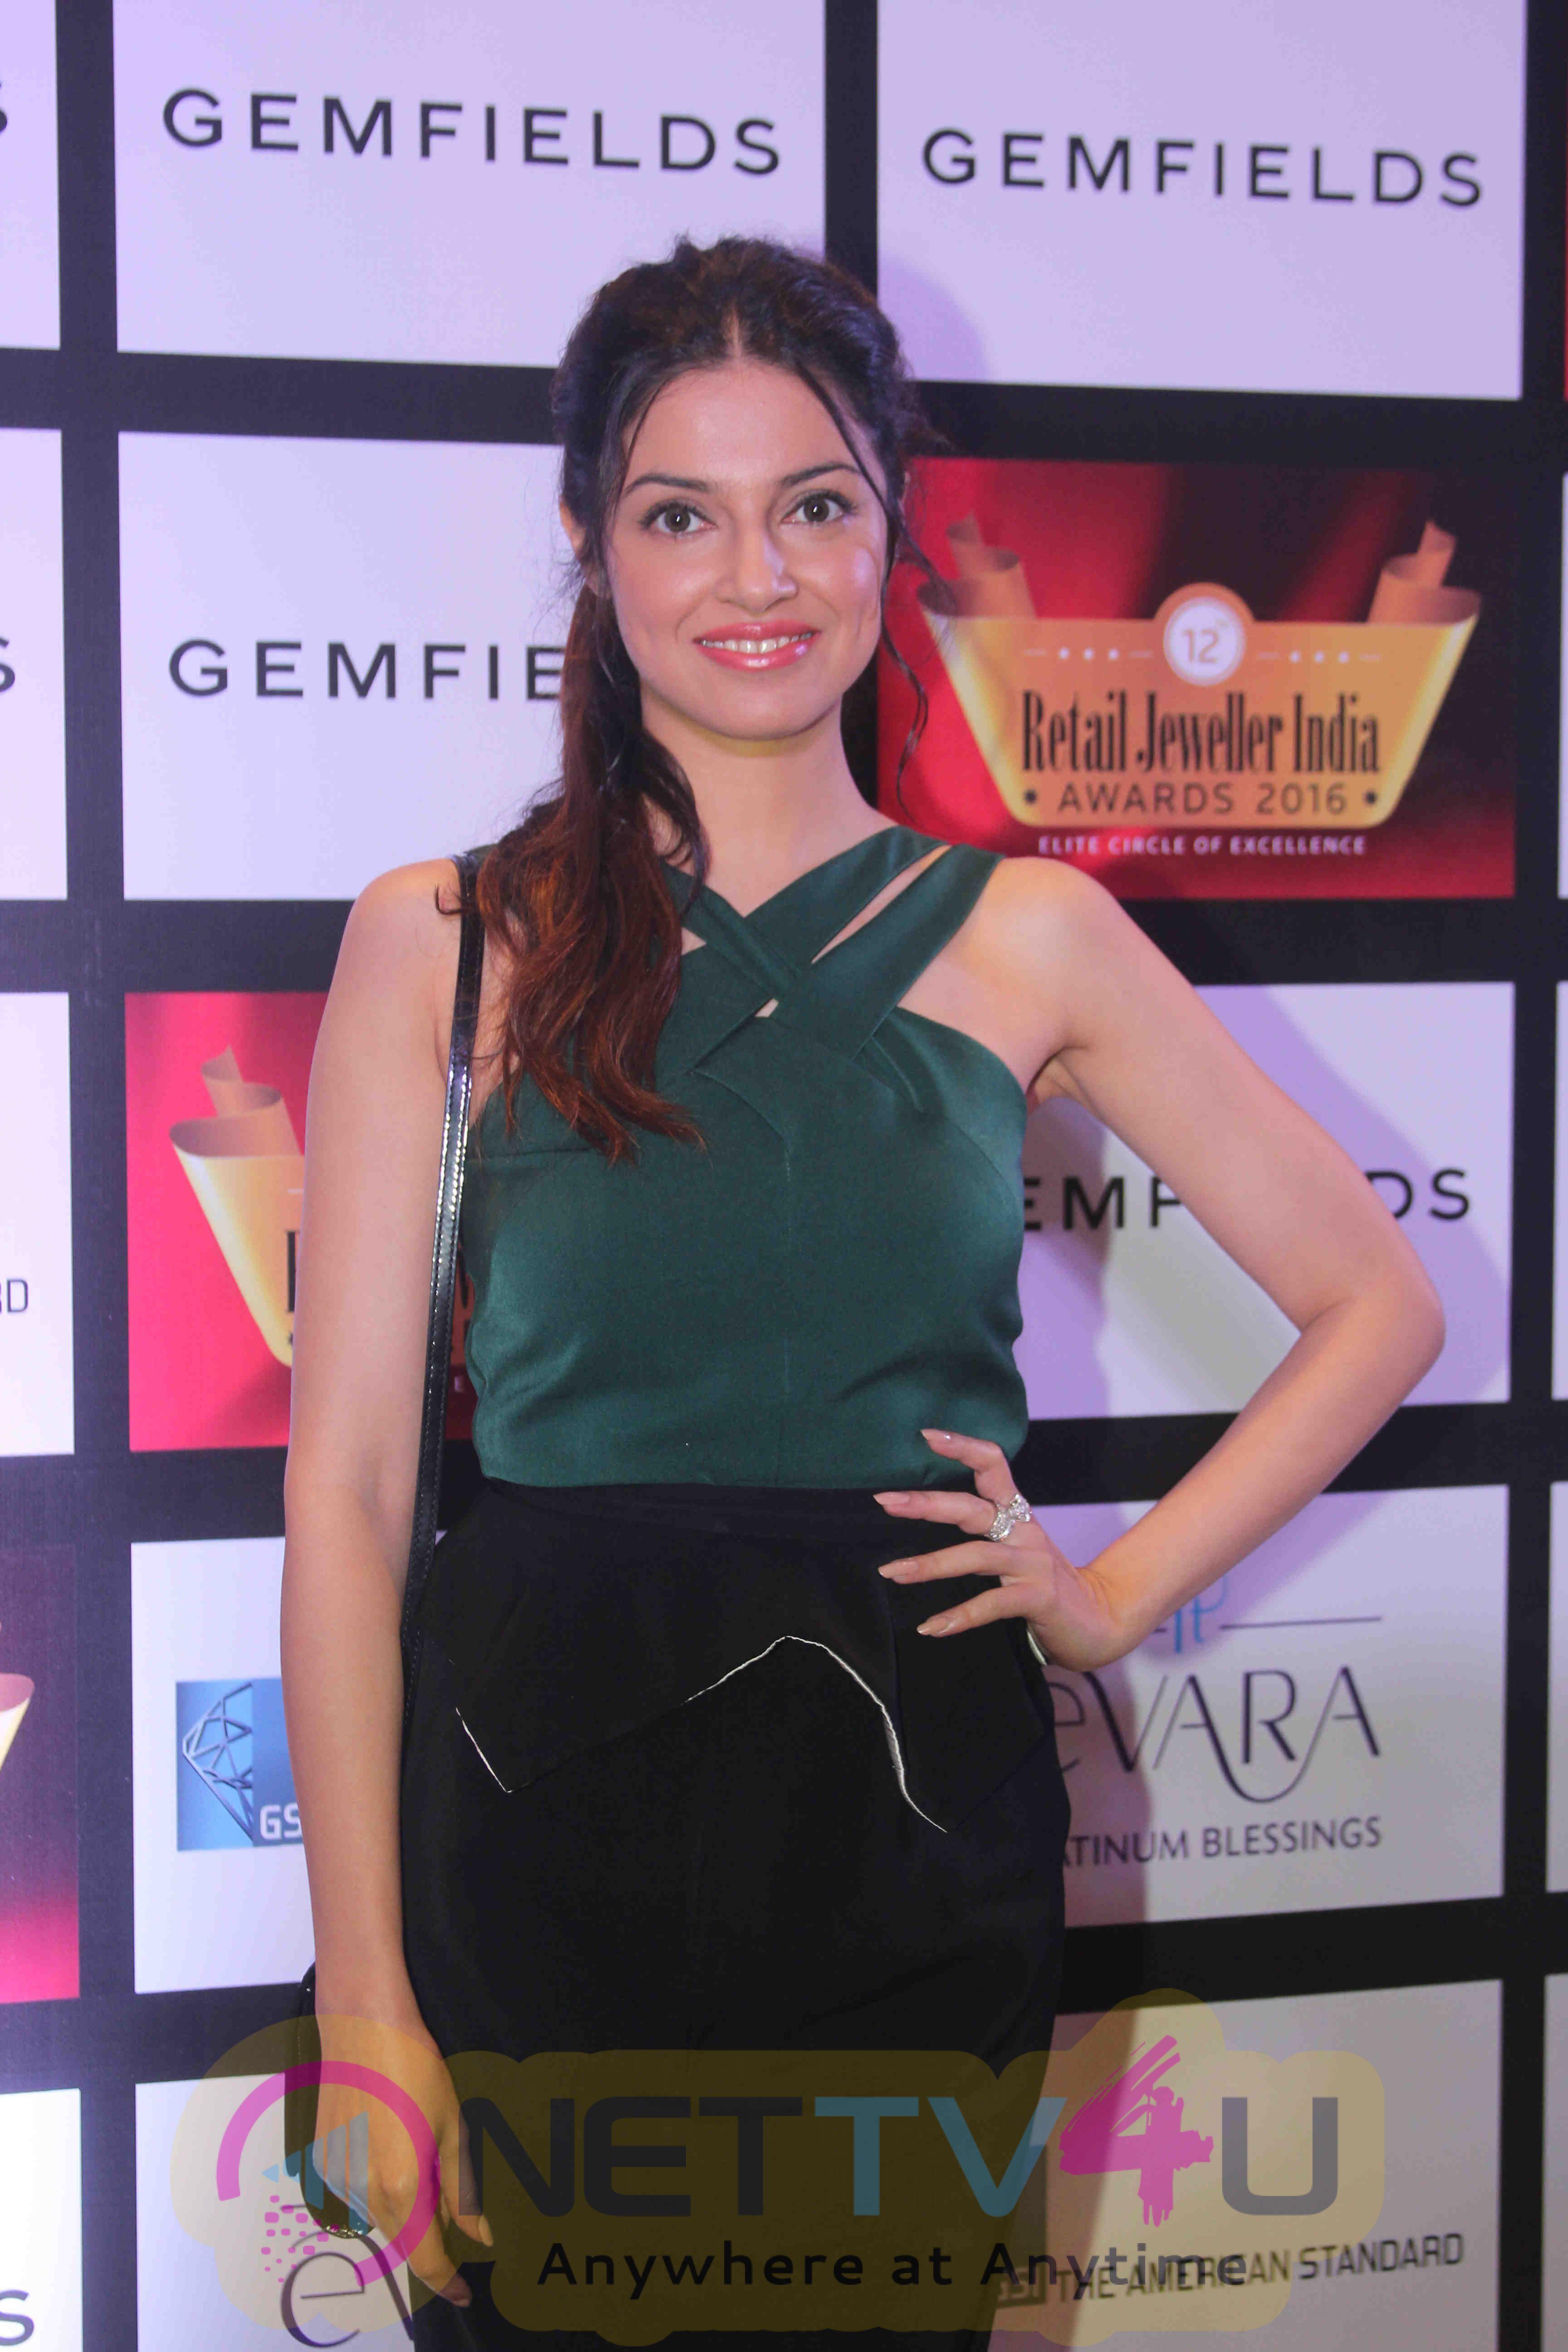 Retail Jeweller India Awards 2016 Grand Jury Meet Statuesque Stills Hindi Gallery